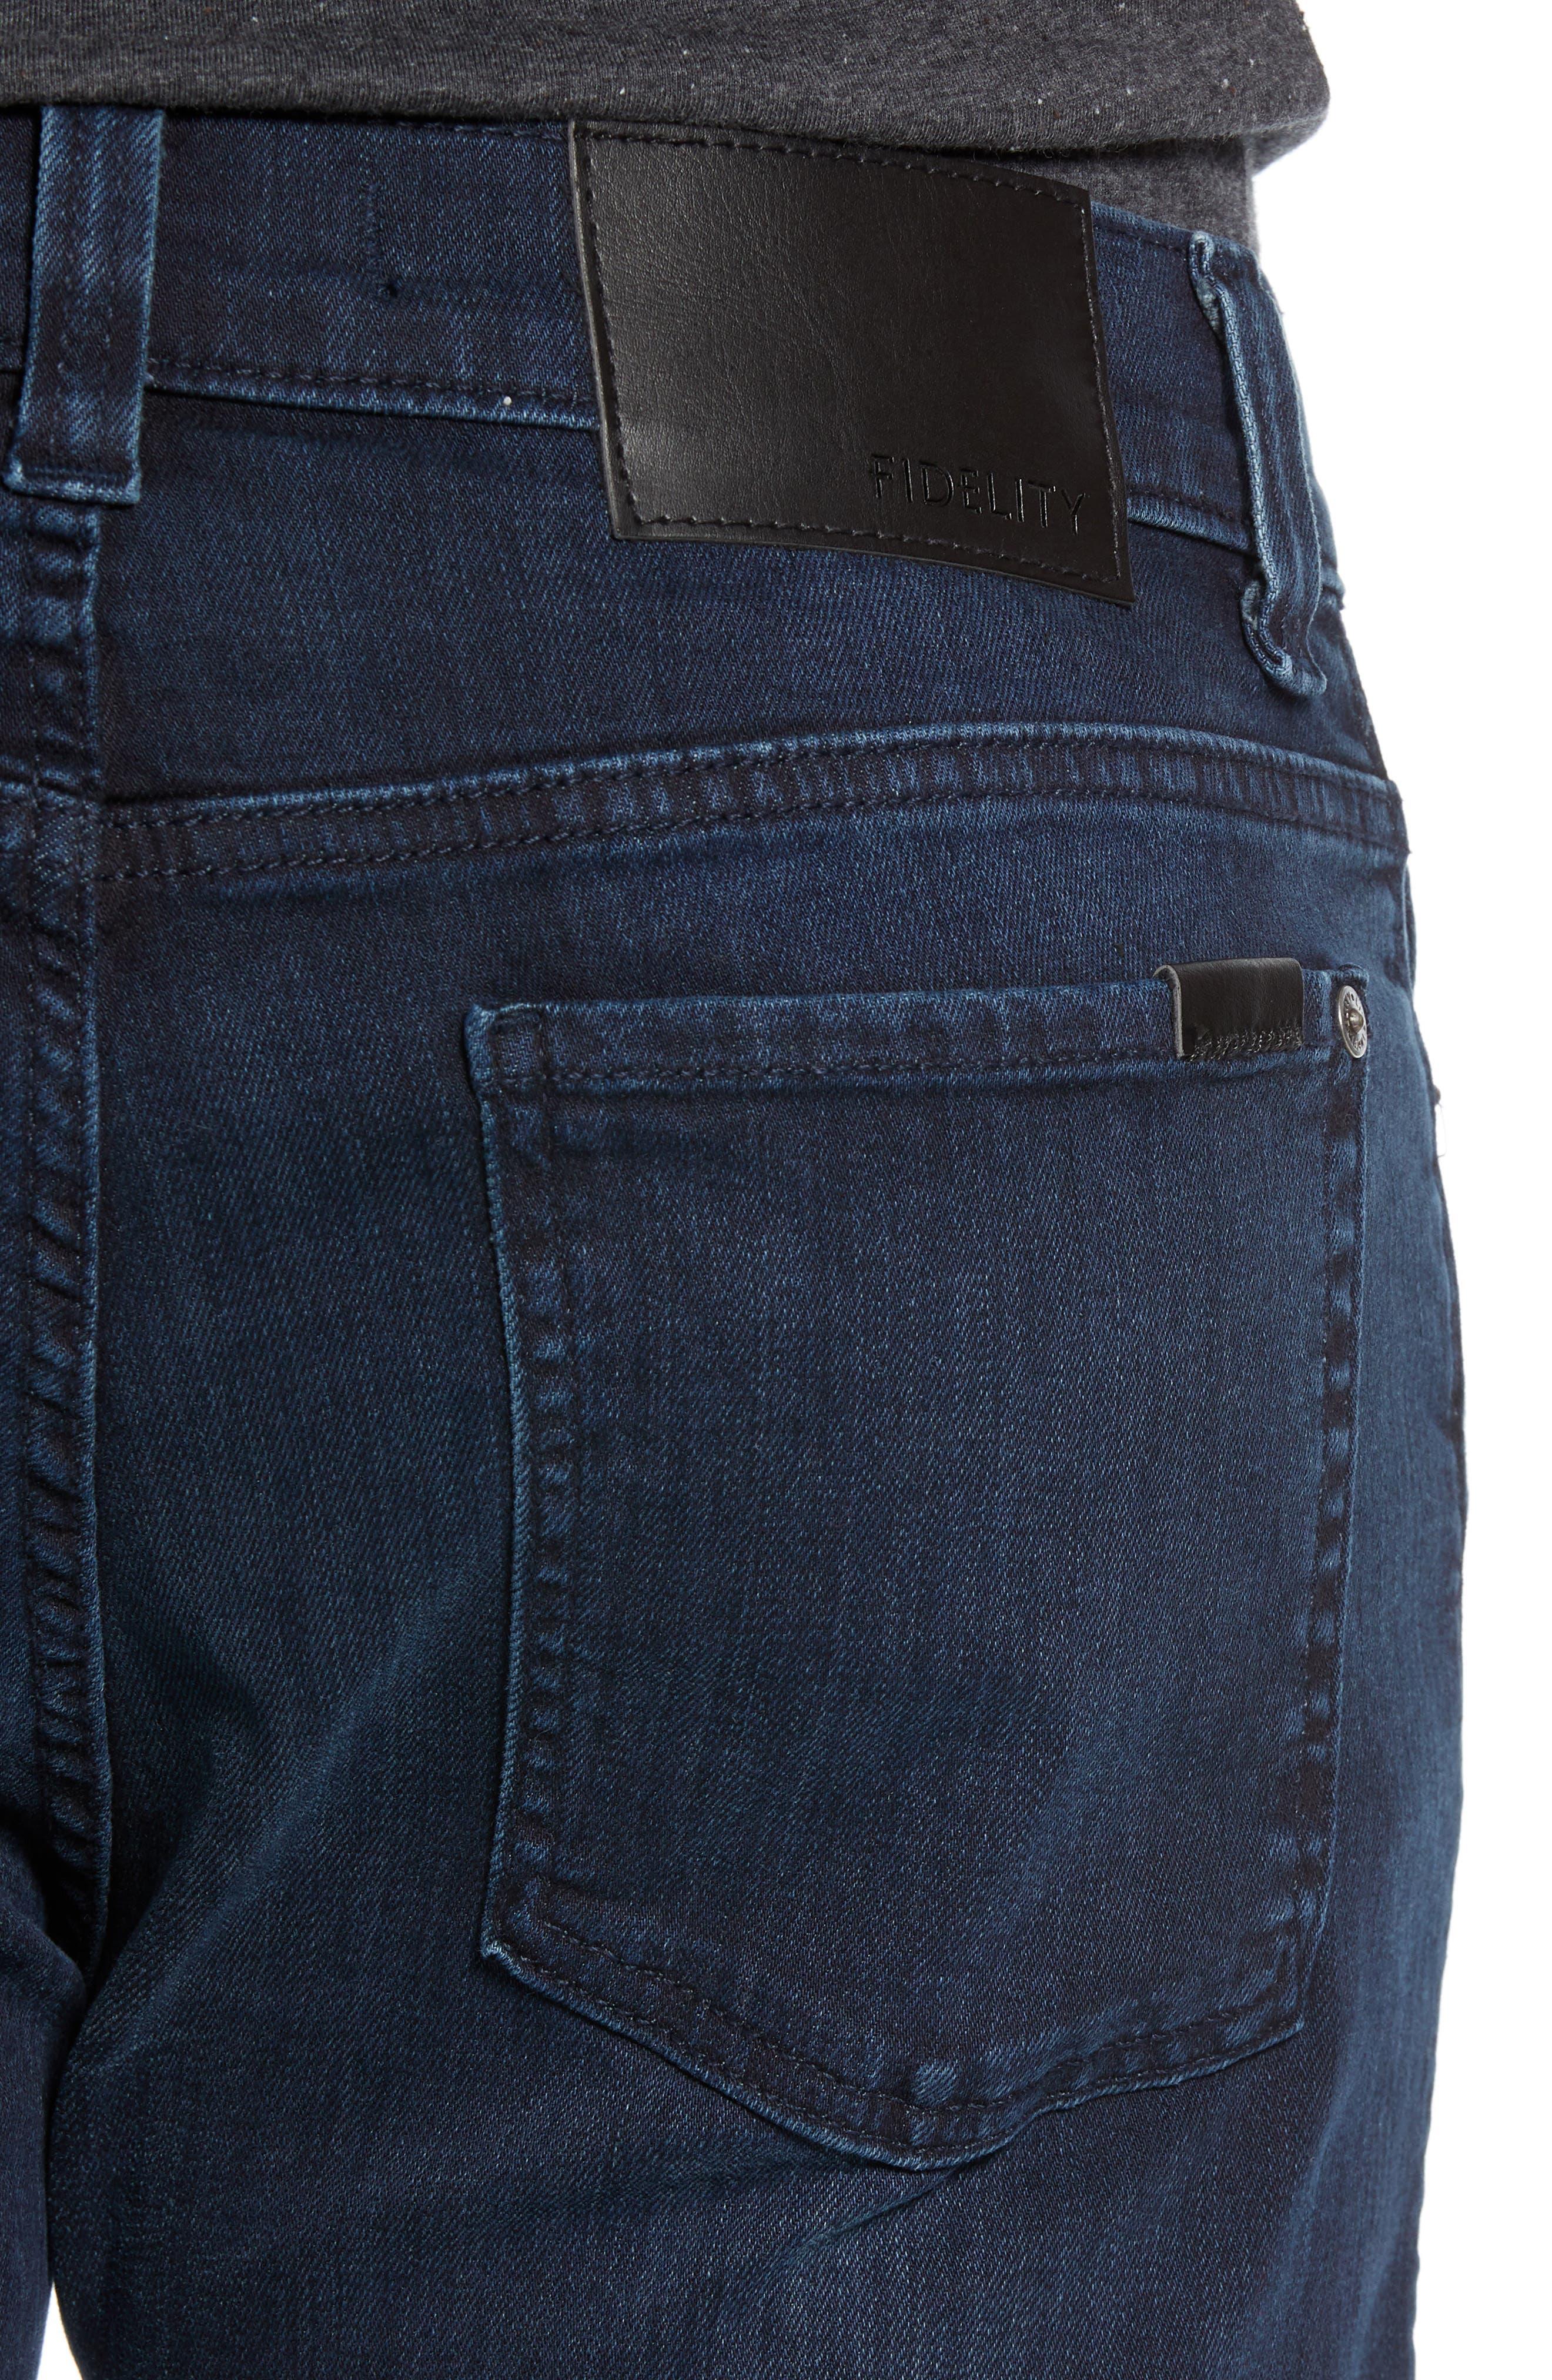 Impala Straight Leg Jeans,                             Alternate thumbnail 4, color,                             GENESIS